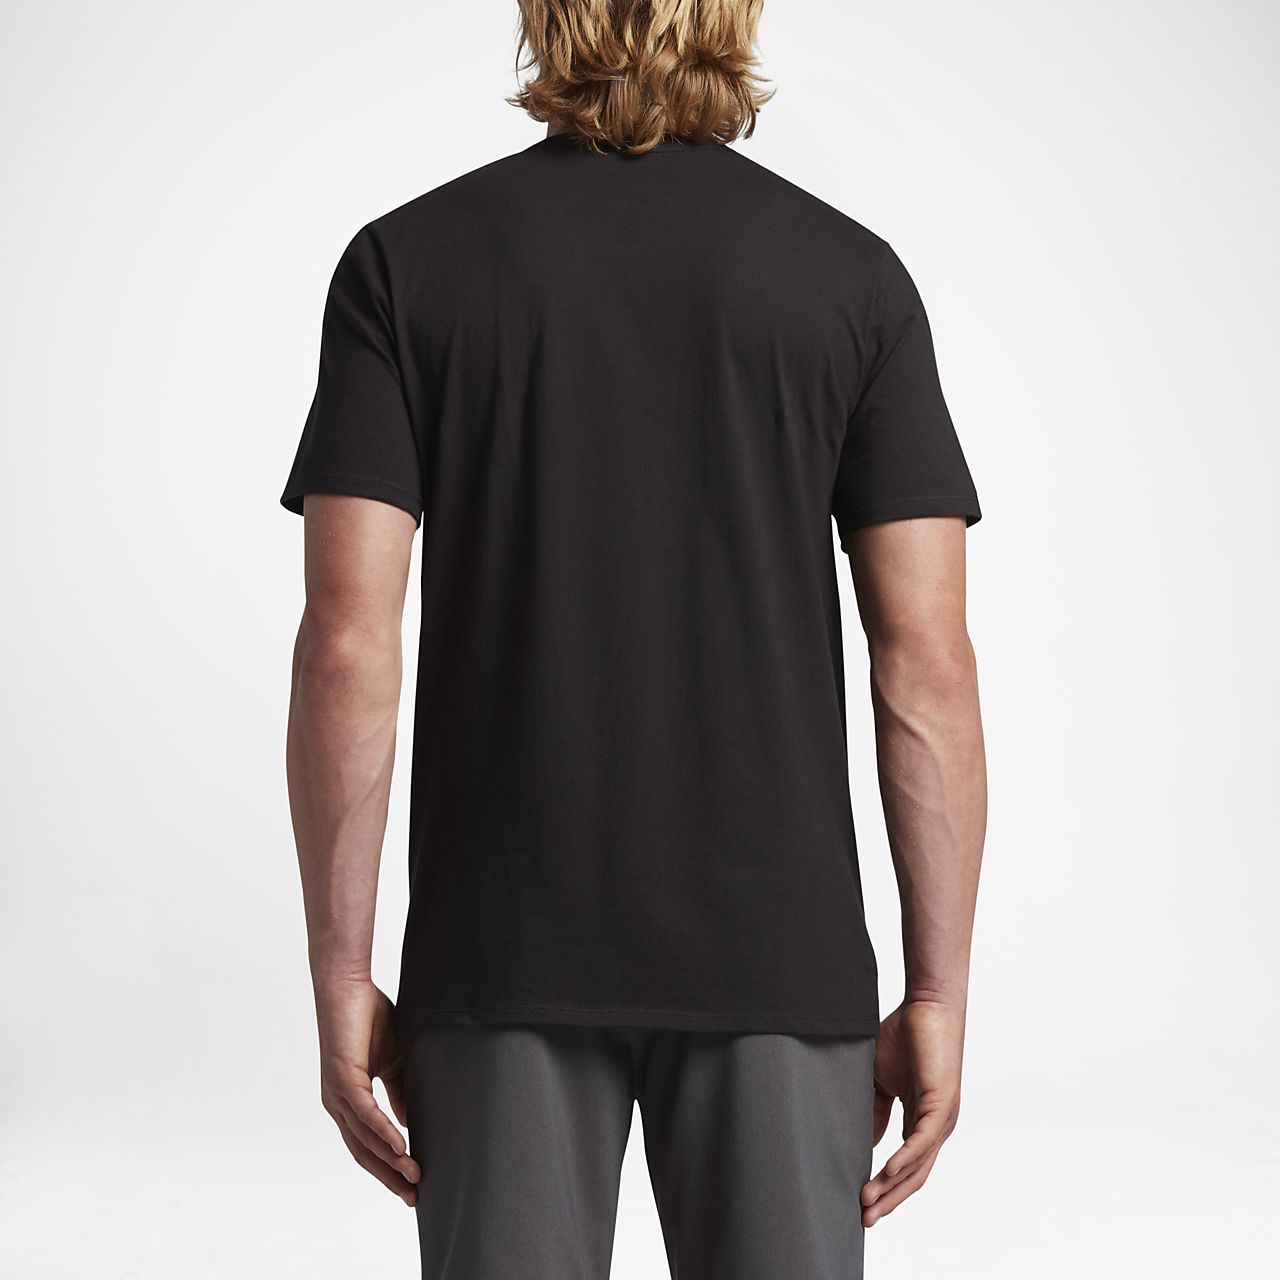 d60f8432ee43 Hurley JJF x Sig Zane Men s T-shirt. Nike.com SA